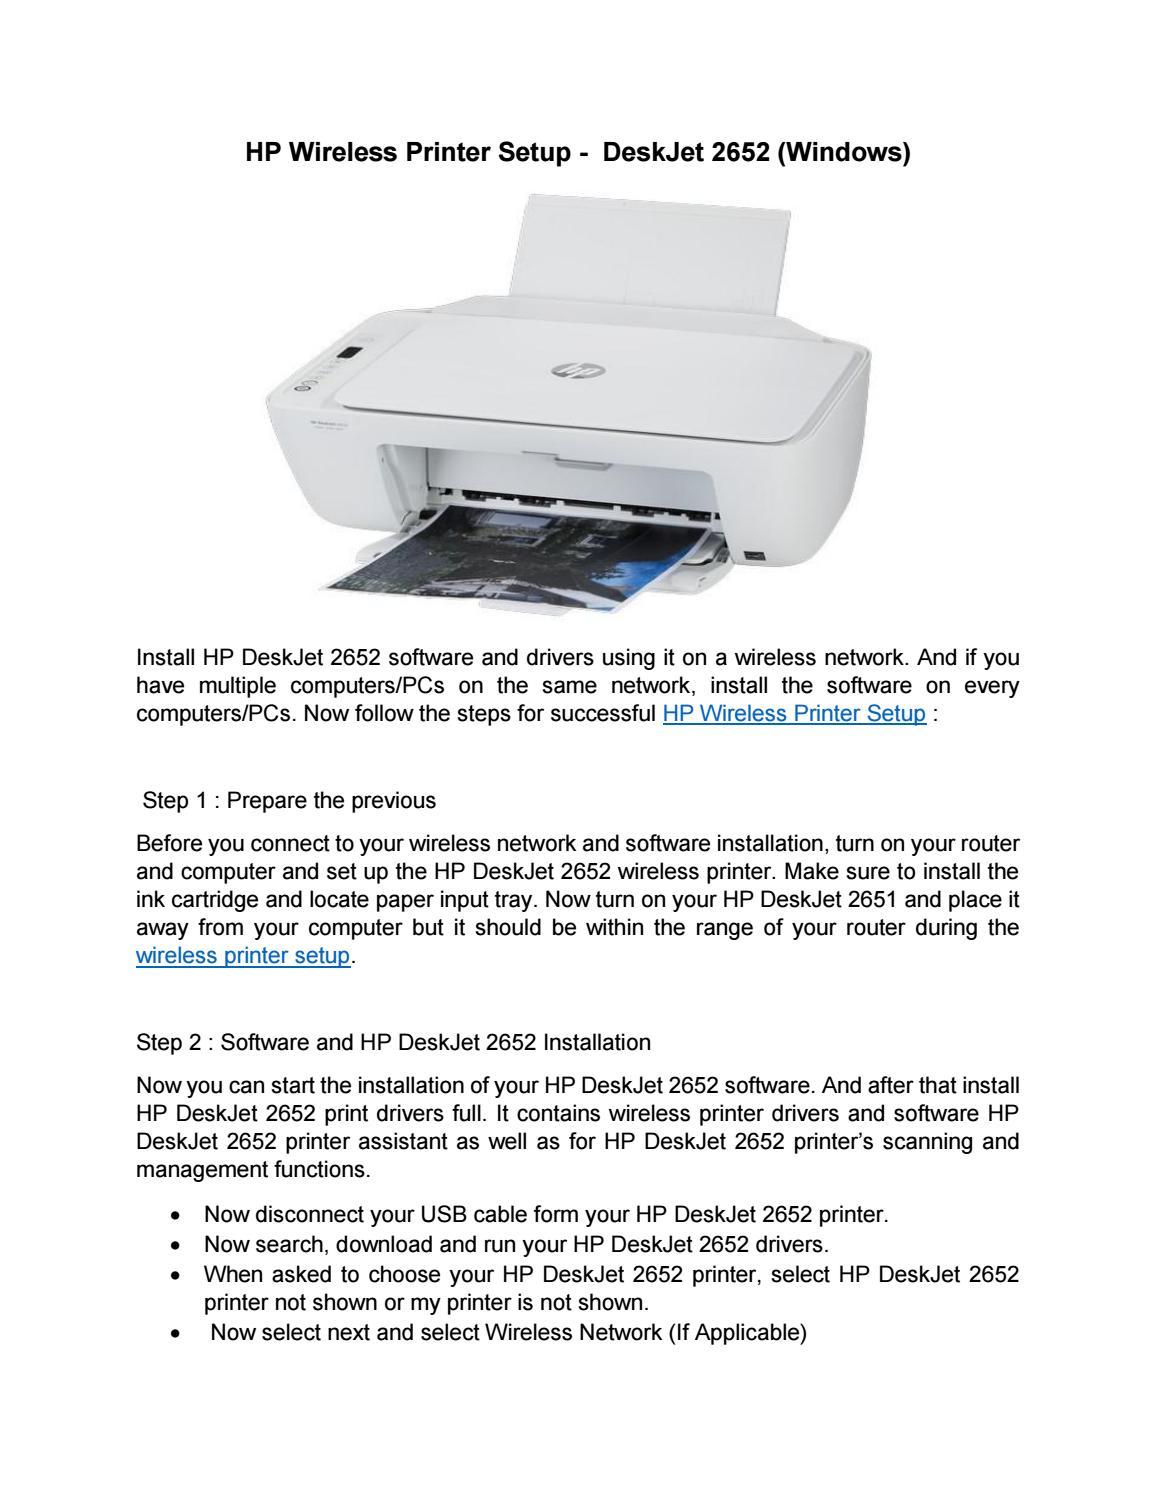 Hp Deskjet 2652 Printer Installation